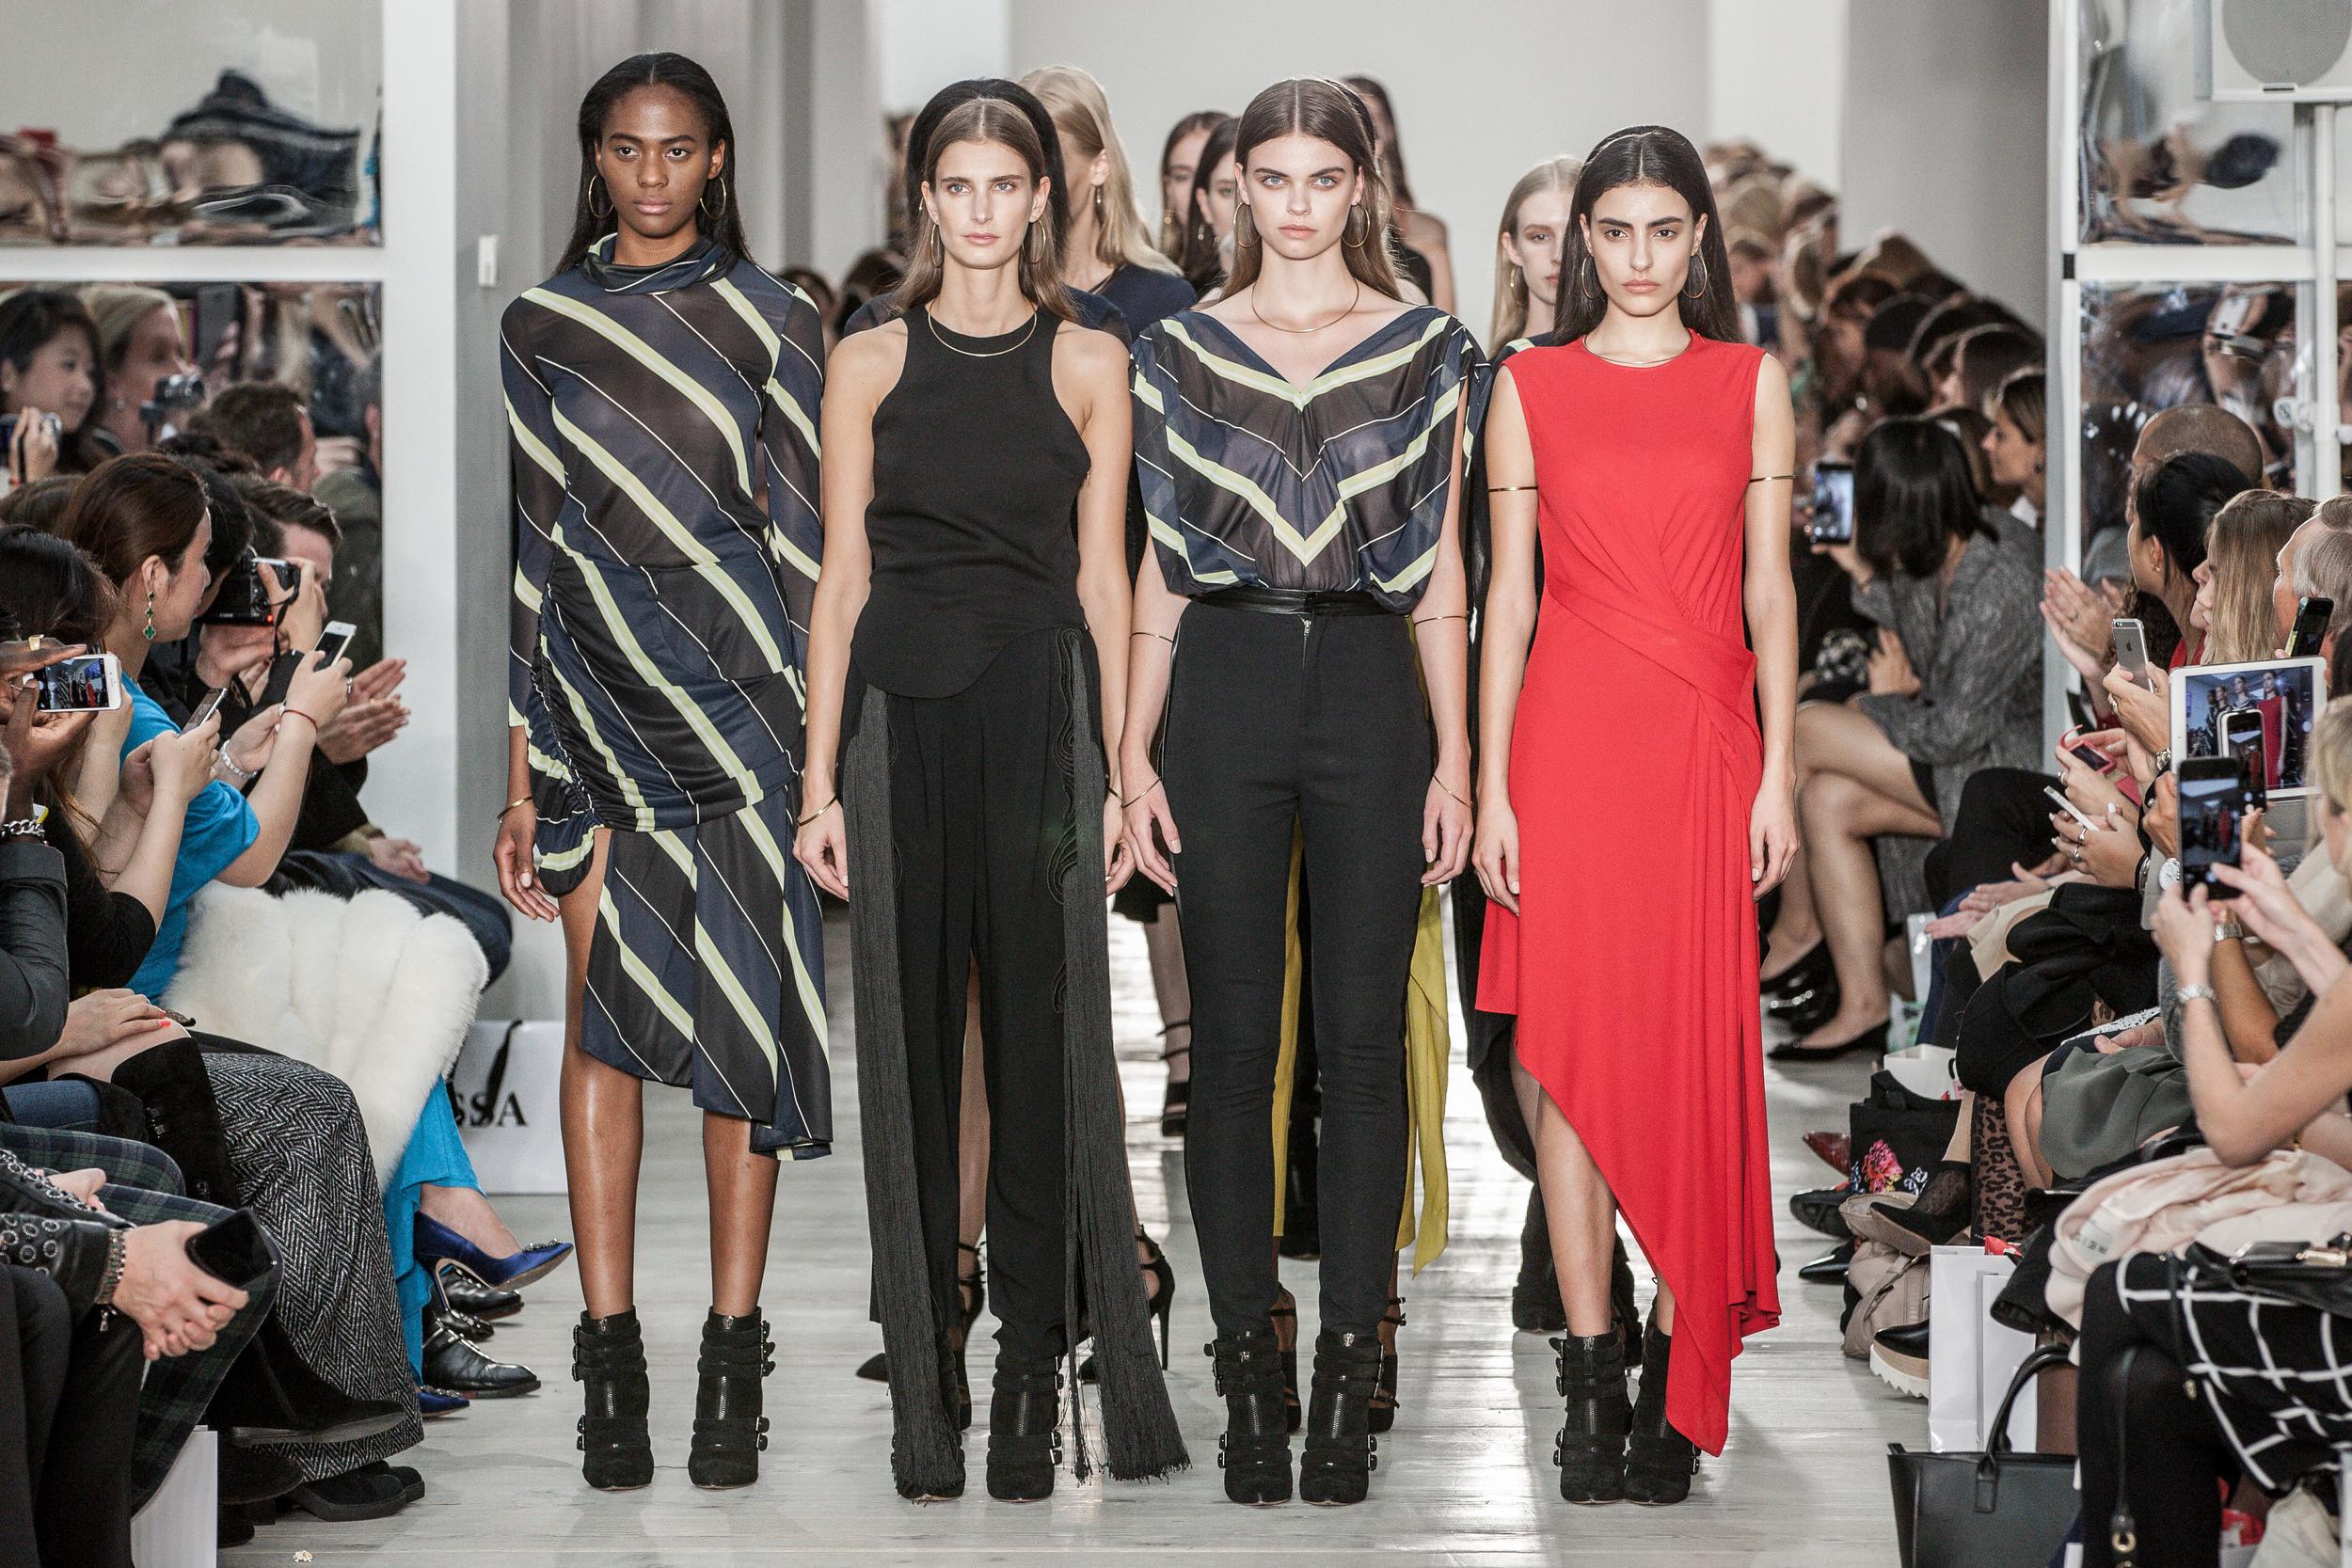 London_Fashion_Week_by_Sam_Geals_InlineSix_Photography0166.jpg